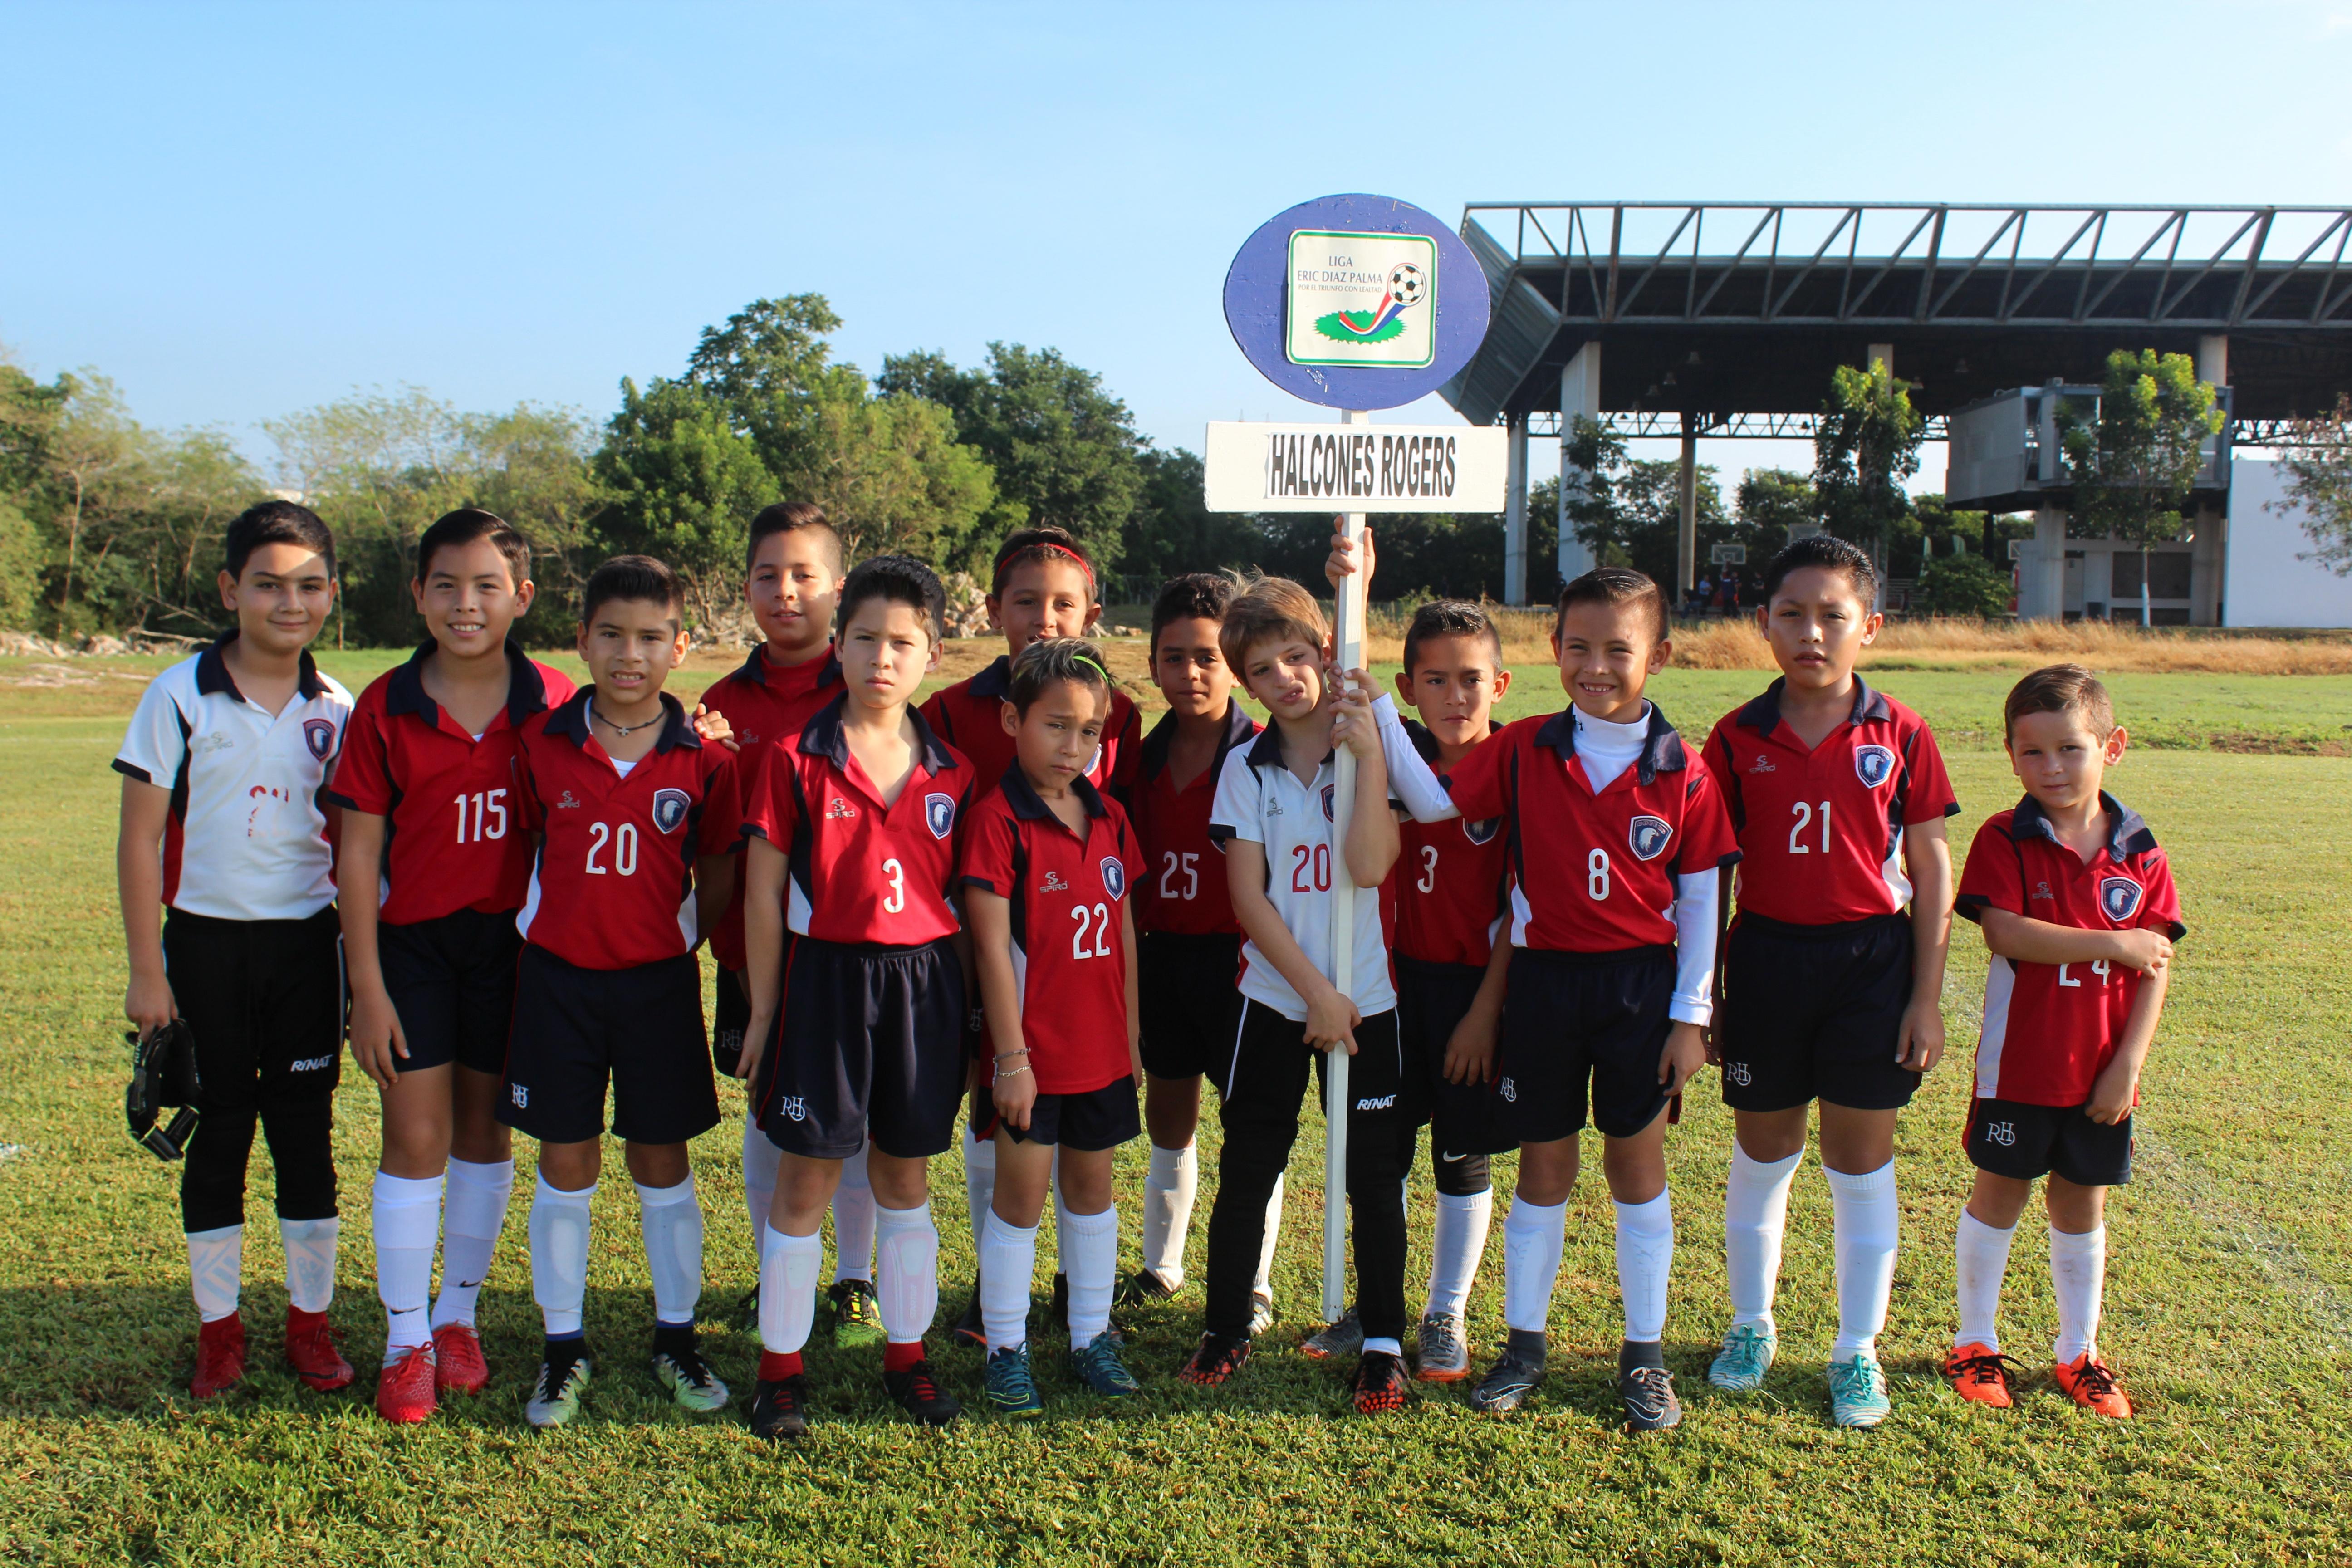 Ligas de futbol infantil en Merida Yucatan